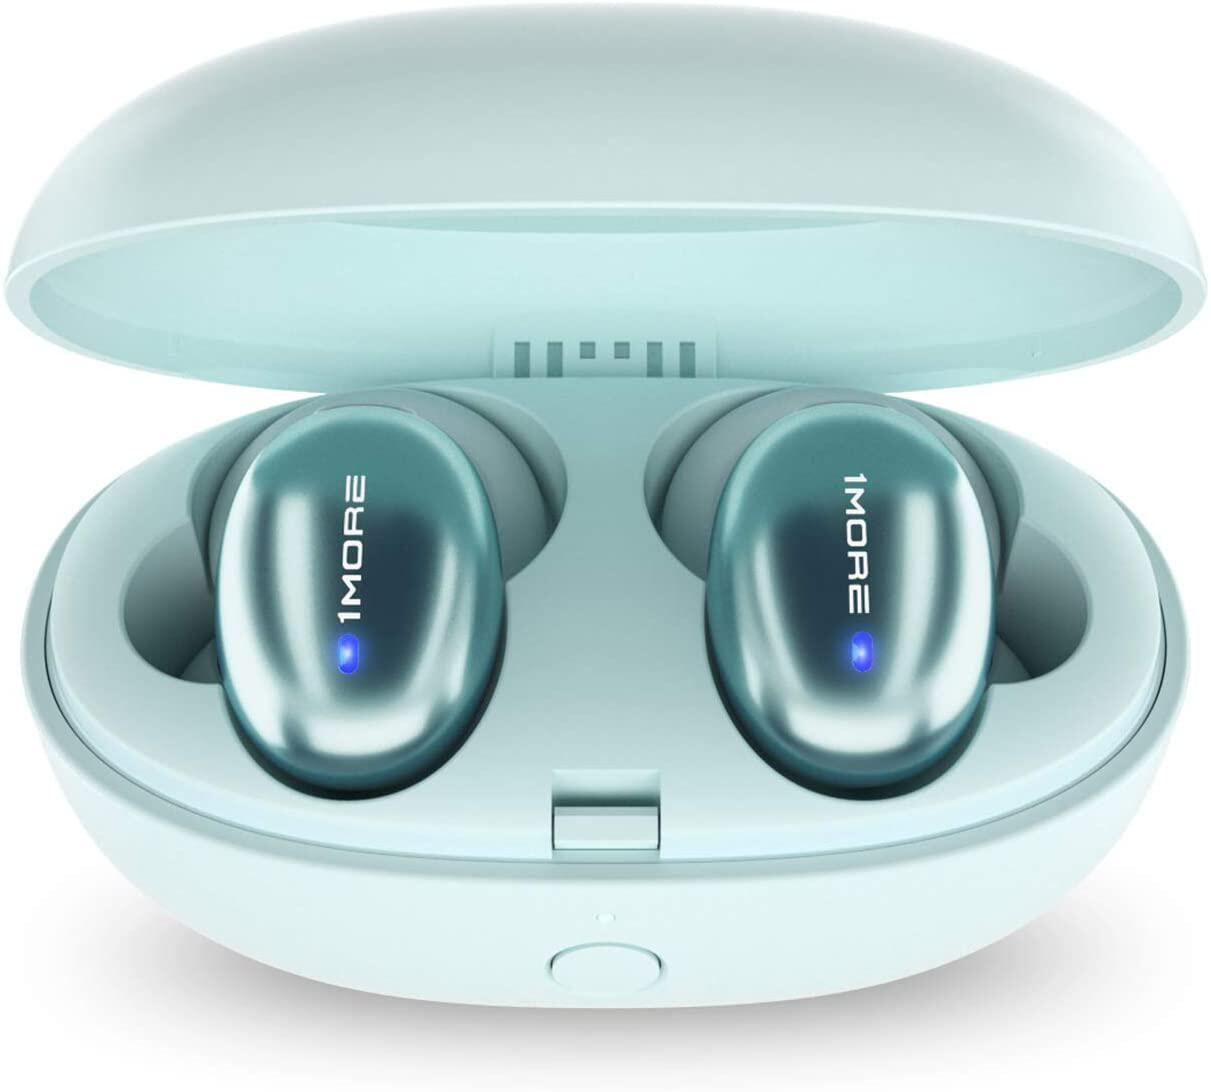 Bild zu Apple, AirPods, Elektonik, Kopfhörer, Alternativen, Bluetooth